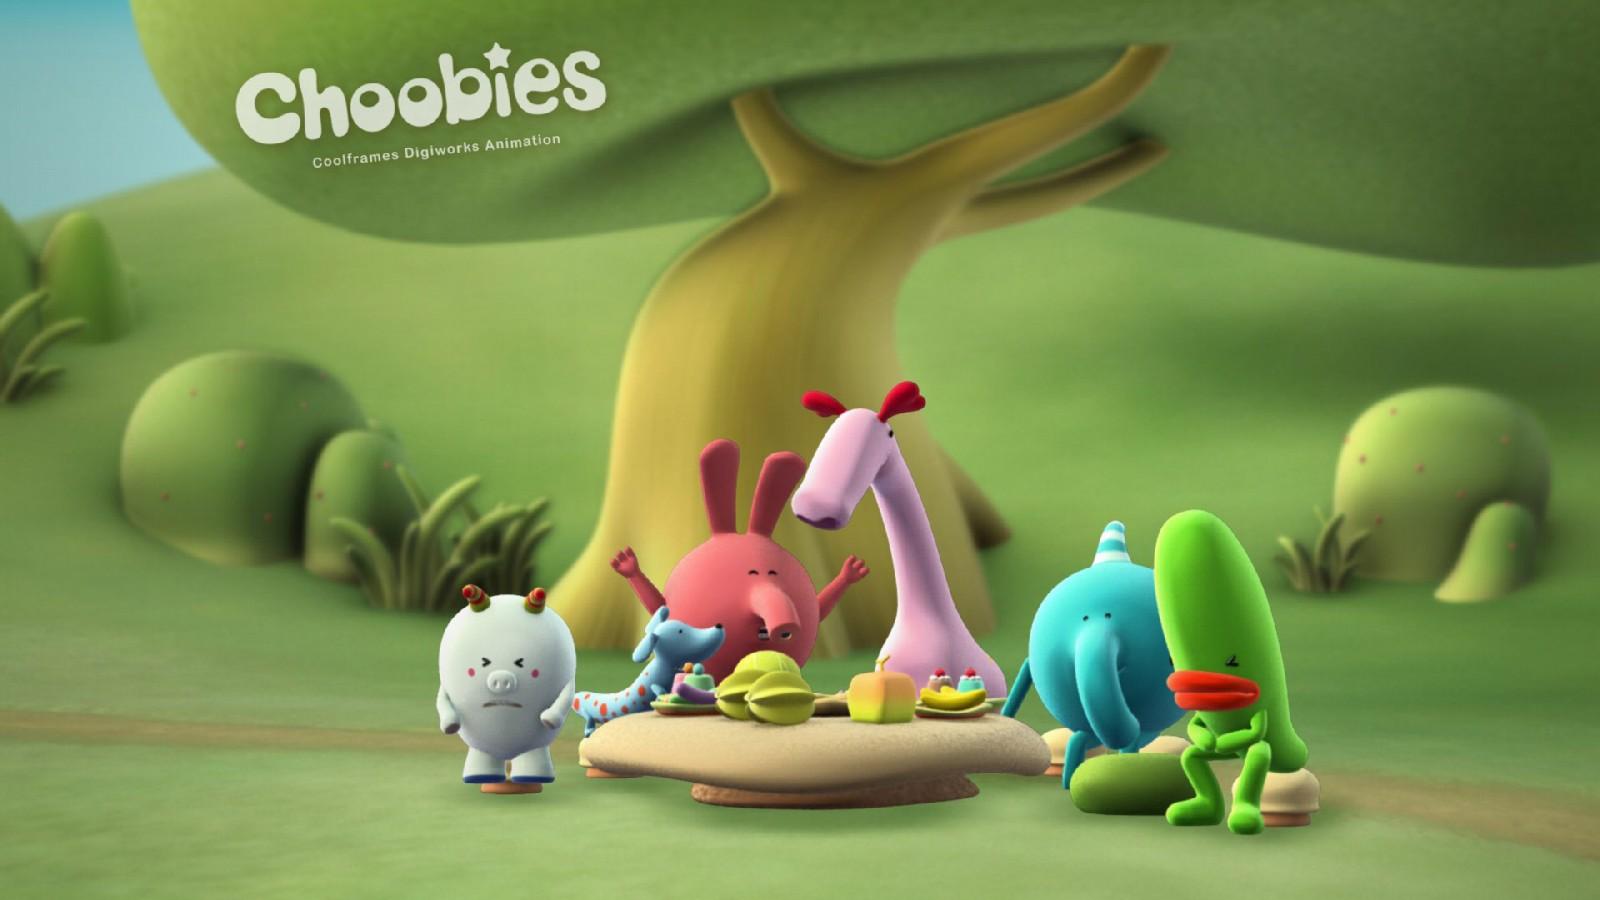 Choobies animated hd cartoons wallpaper hd wallpapers for Wallpaper 3d kids